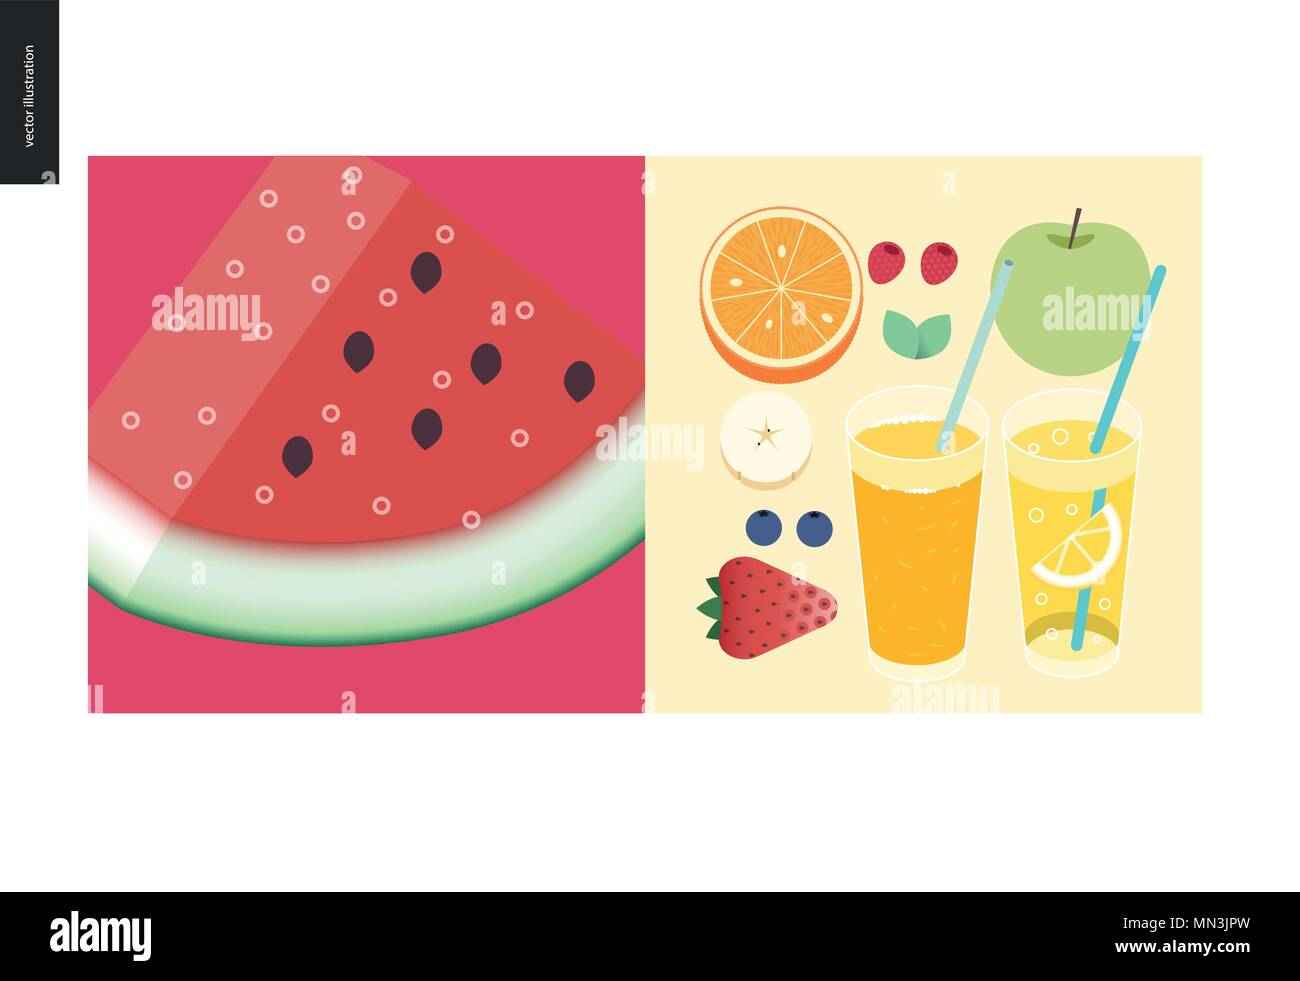 Simple things - meal - flat cartoon vector illustration of a fresh watermelon with seeds, breakfast set, fruits, orange juice, lemonade and berries, r - Stock Vector